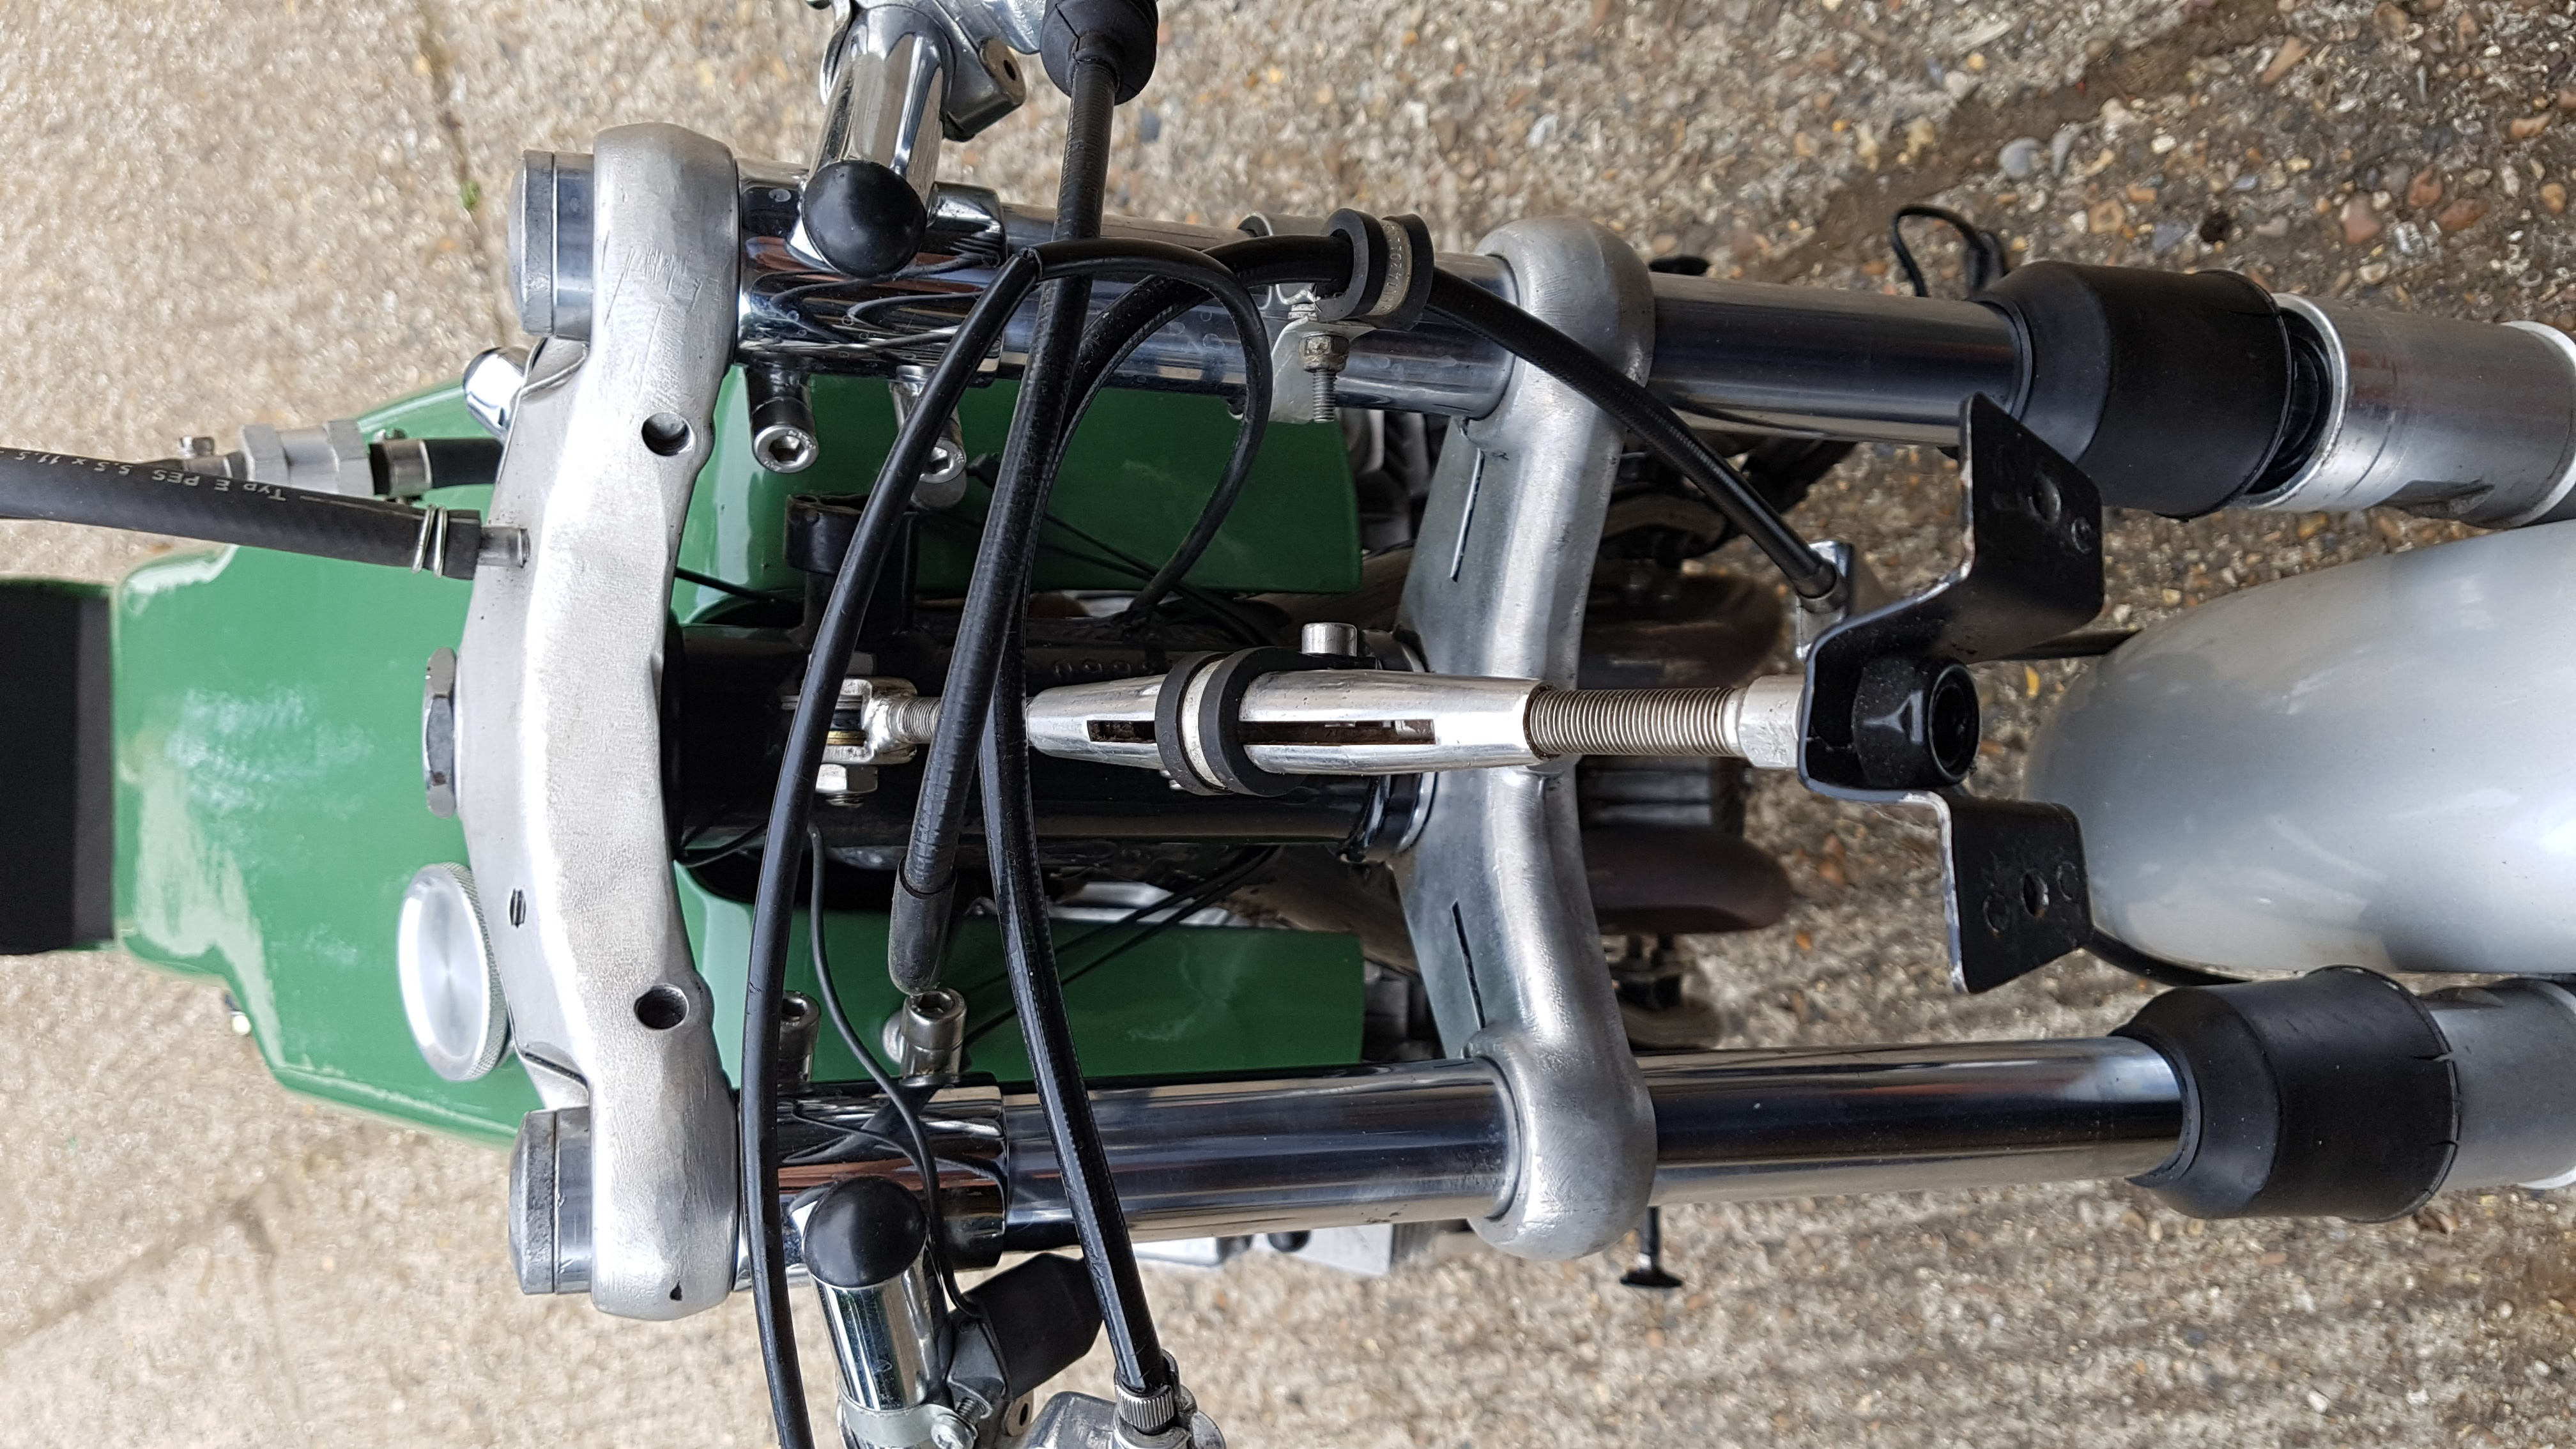 Benelli 500 Pasolini Replica. Ready to race, parade or ride on road. Mot & V5.-20170718_103058.jpg